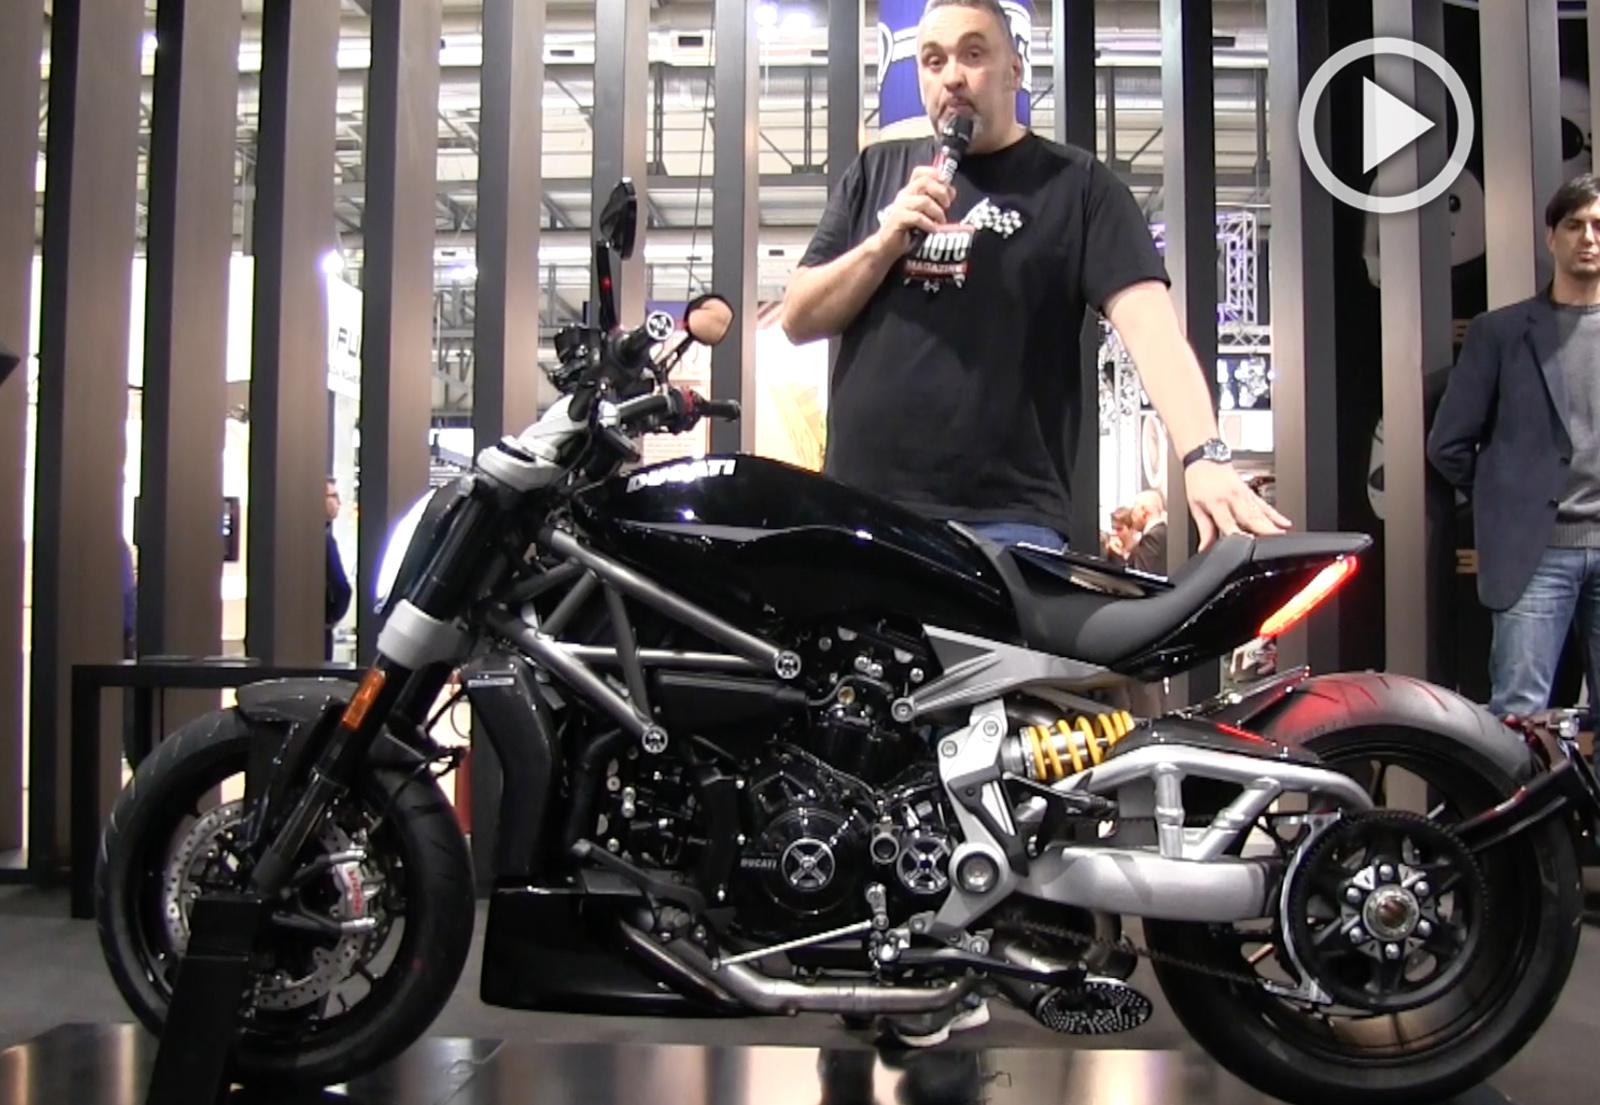 Salons moto 2015 les ducati 2016 en vid o moto for Salon moto milan 2017